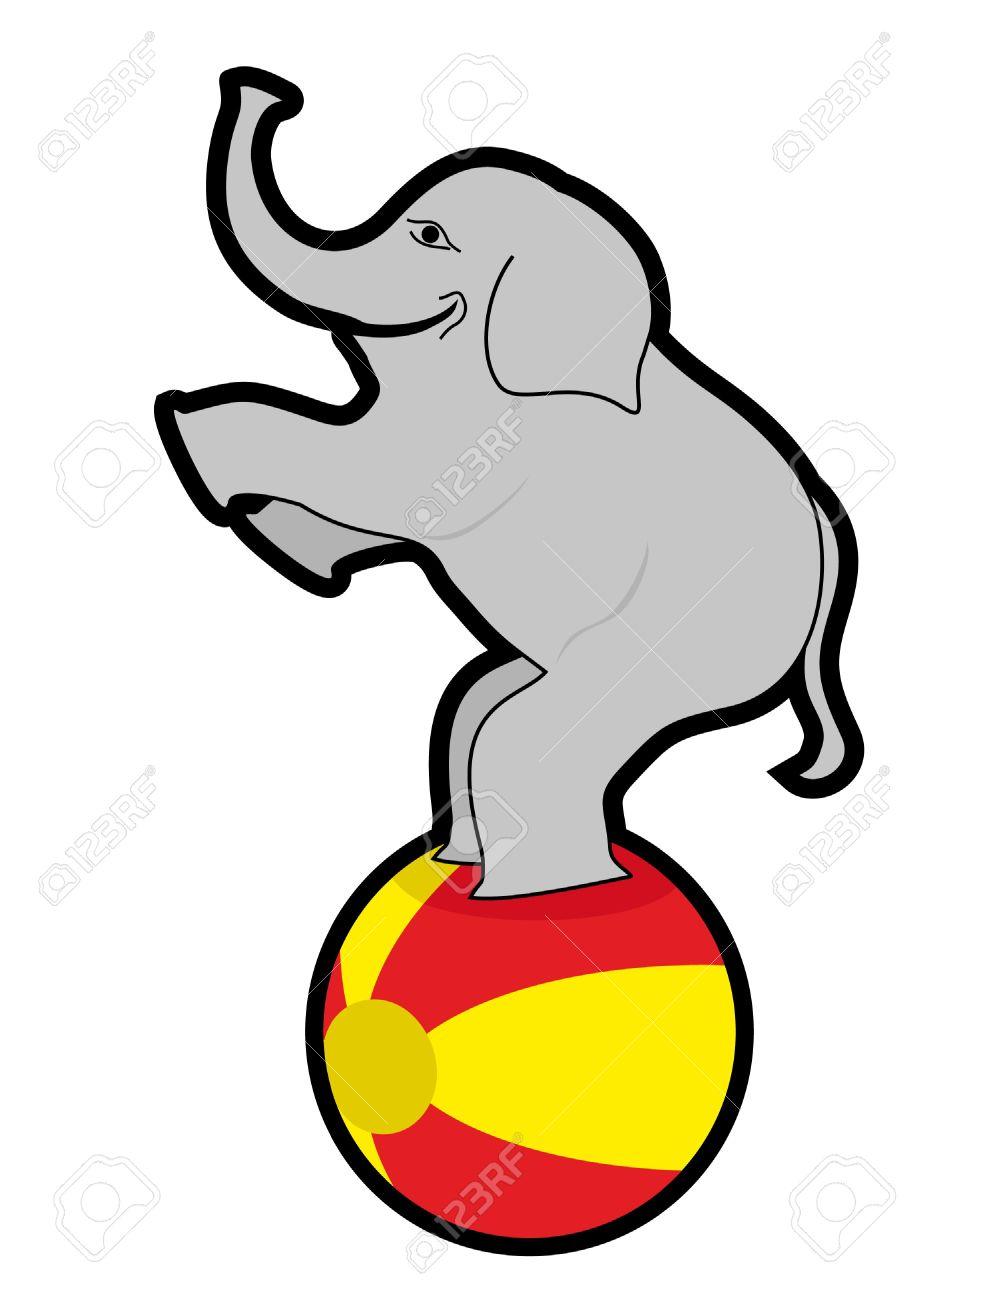 Elephant Balancing On A Ball Royalty Free Cliparts, Vectors, And ...